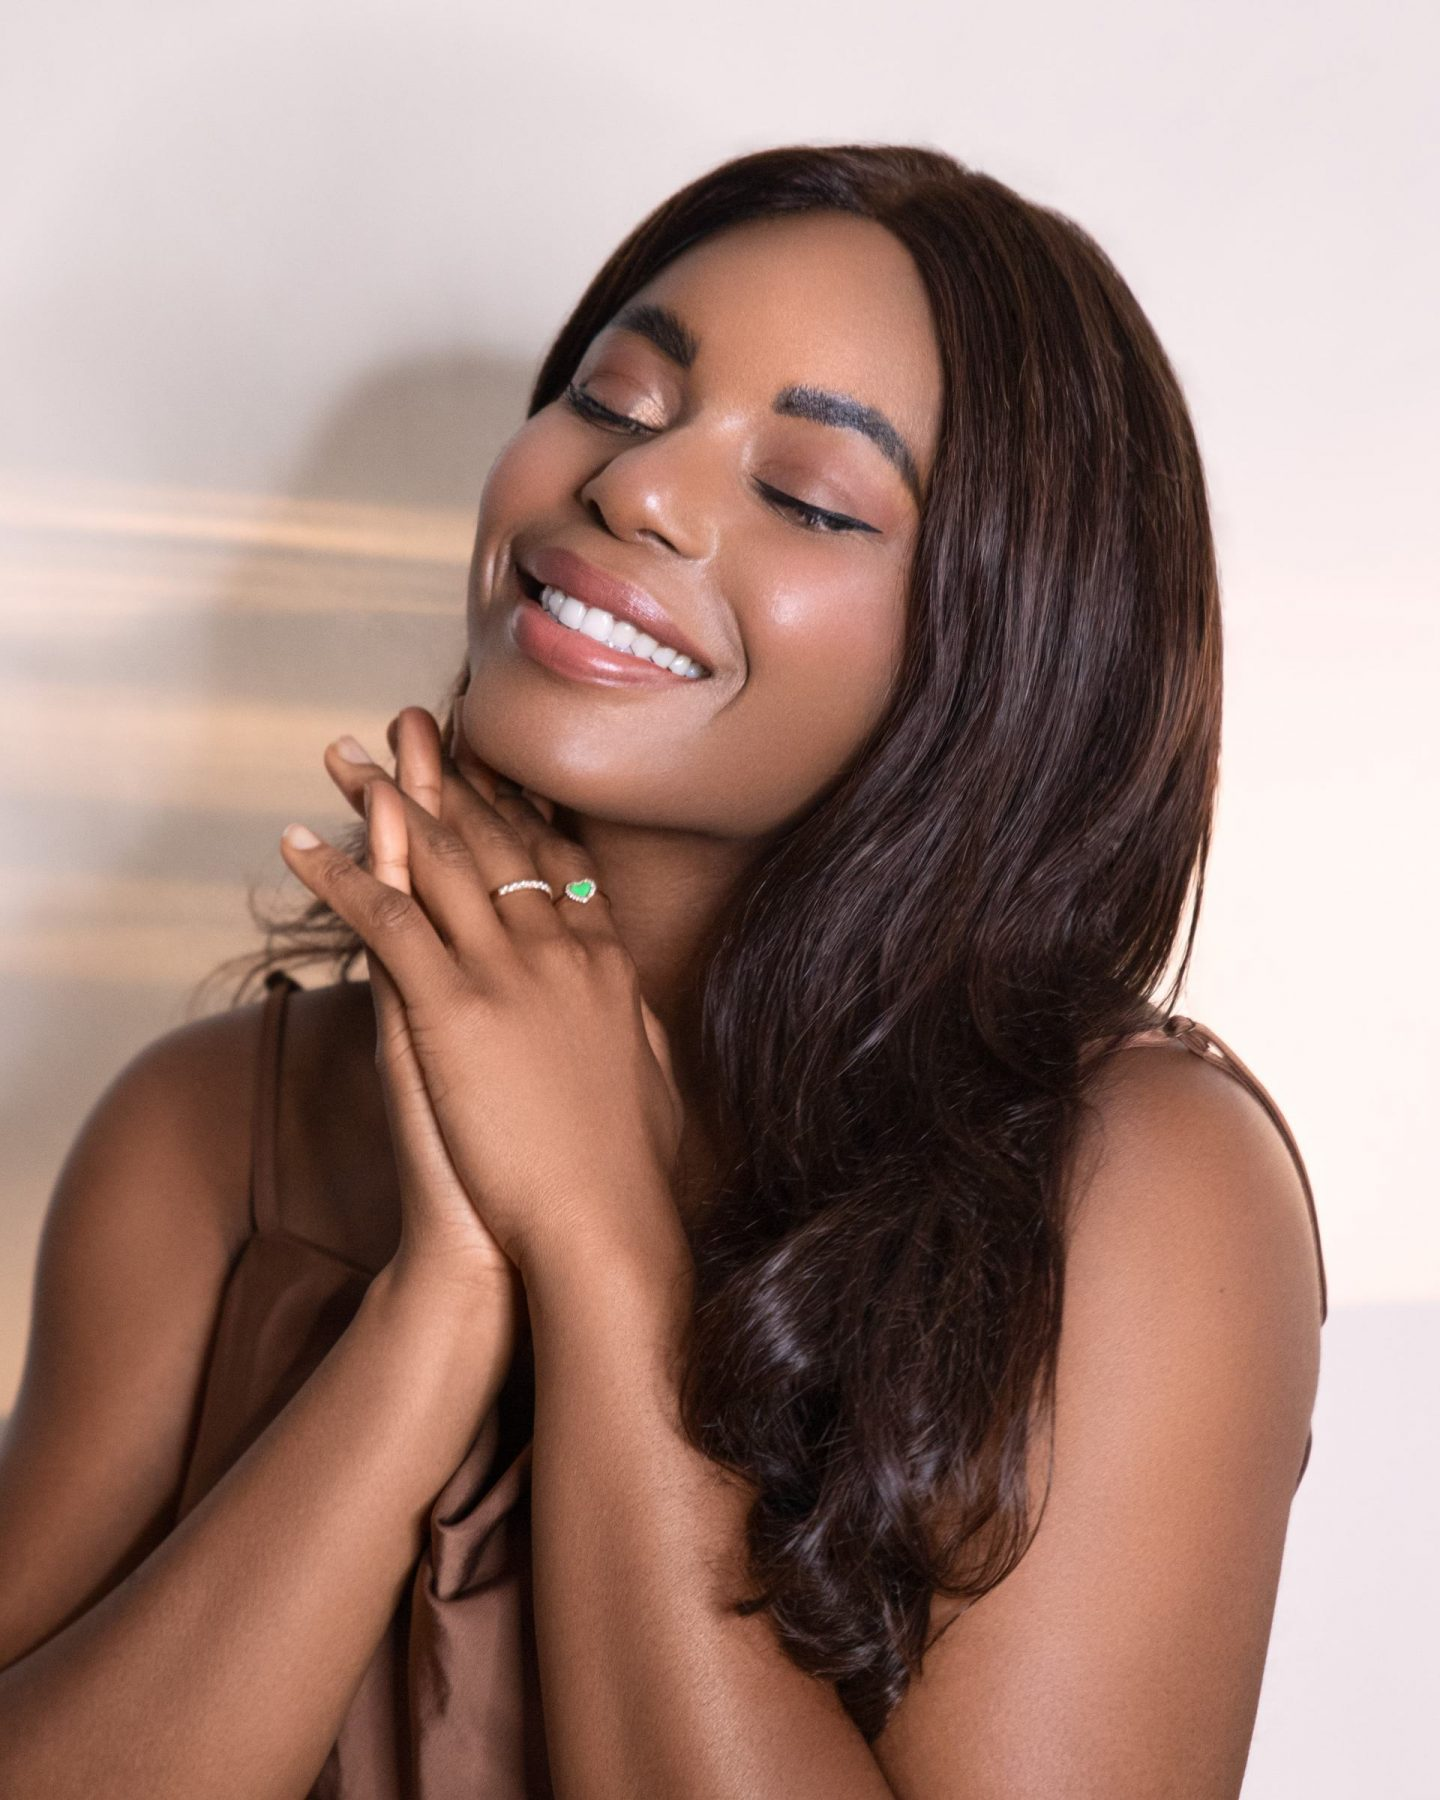 Kaye Bassey beauty shot featuring hair care tips